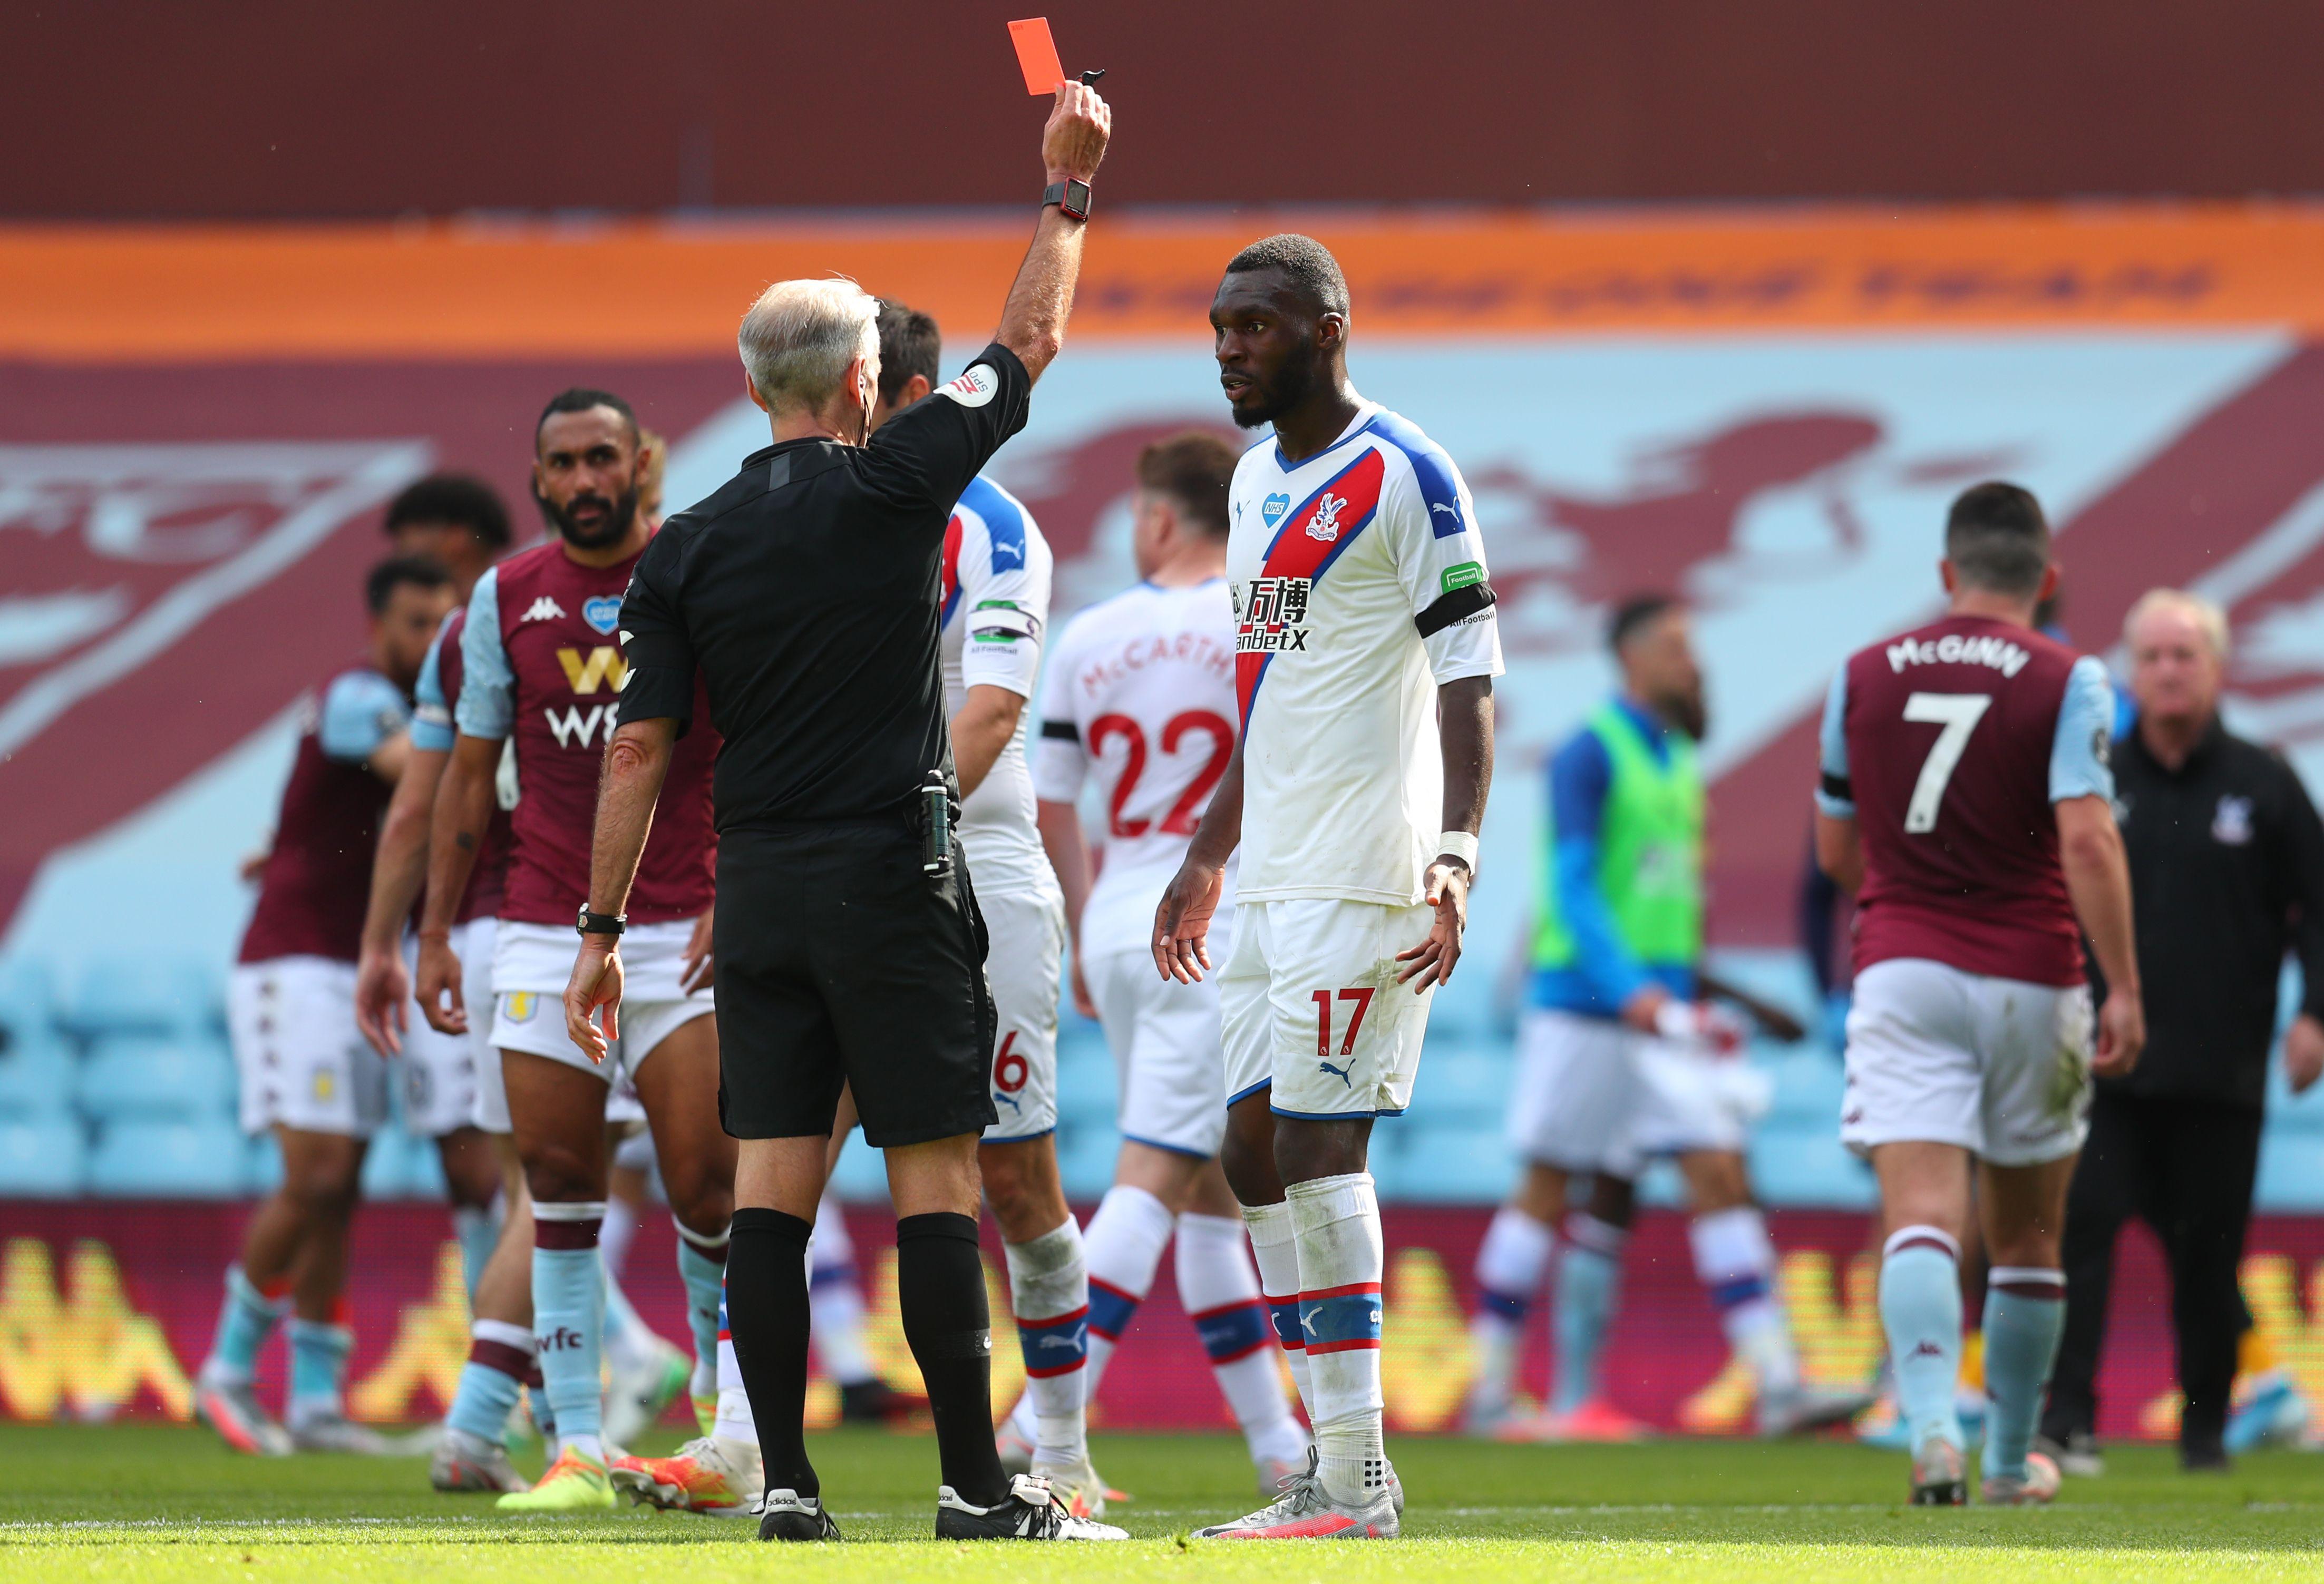 Crystal Palace striker Christian Benteke sent off for kicking Ezri Konsa AFTER full-time in Aston Villa clash thumbnail